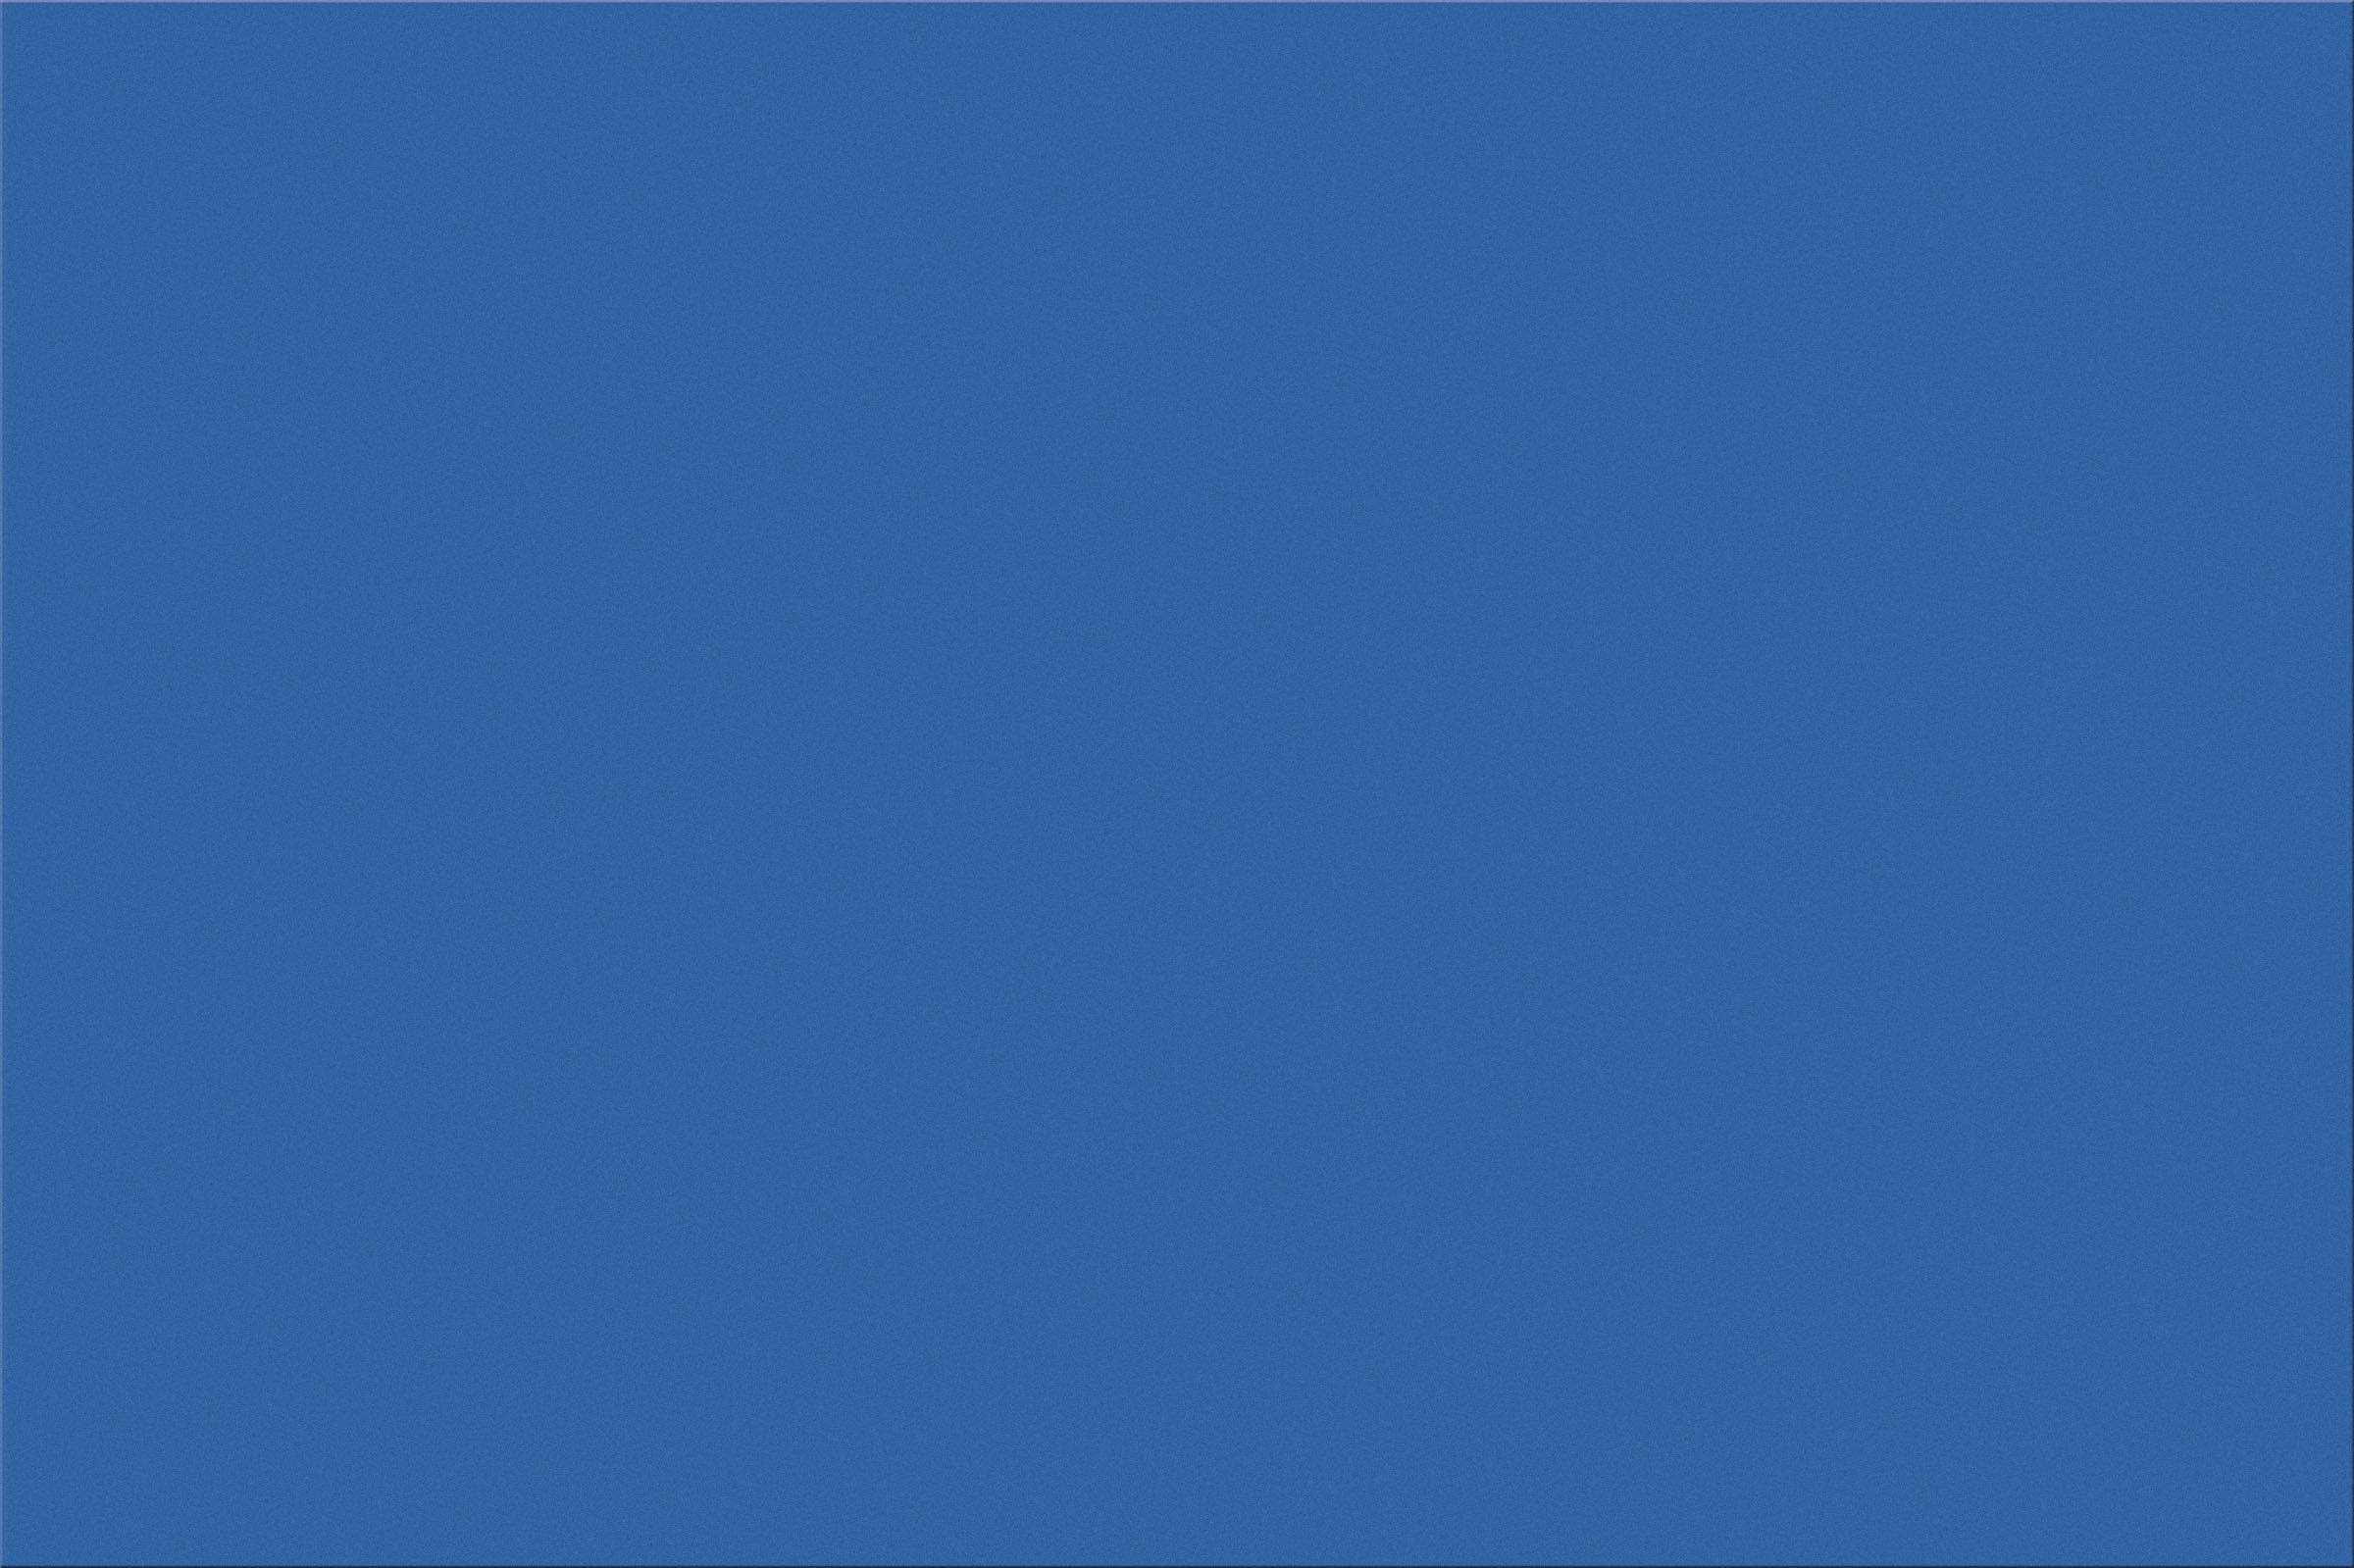 Pacon SunWorks Construction Paper, 12'' x 18'', 100-Count, Dark Blue (7308)